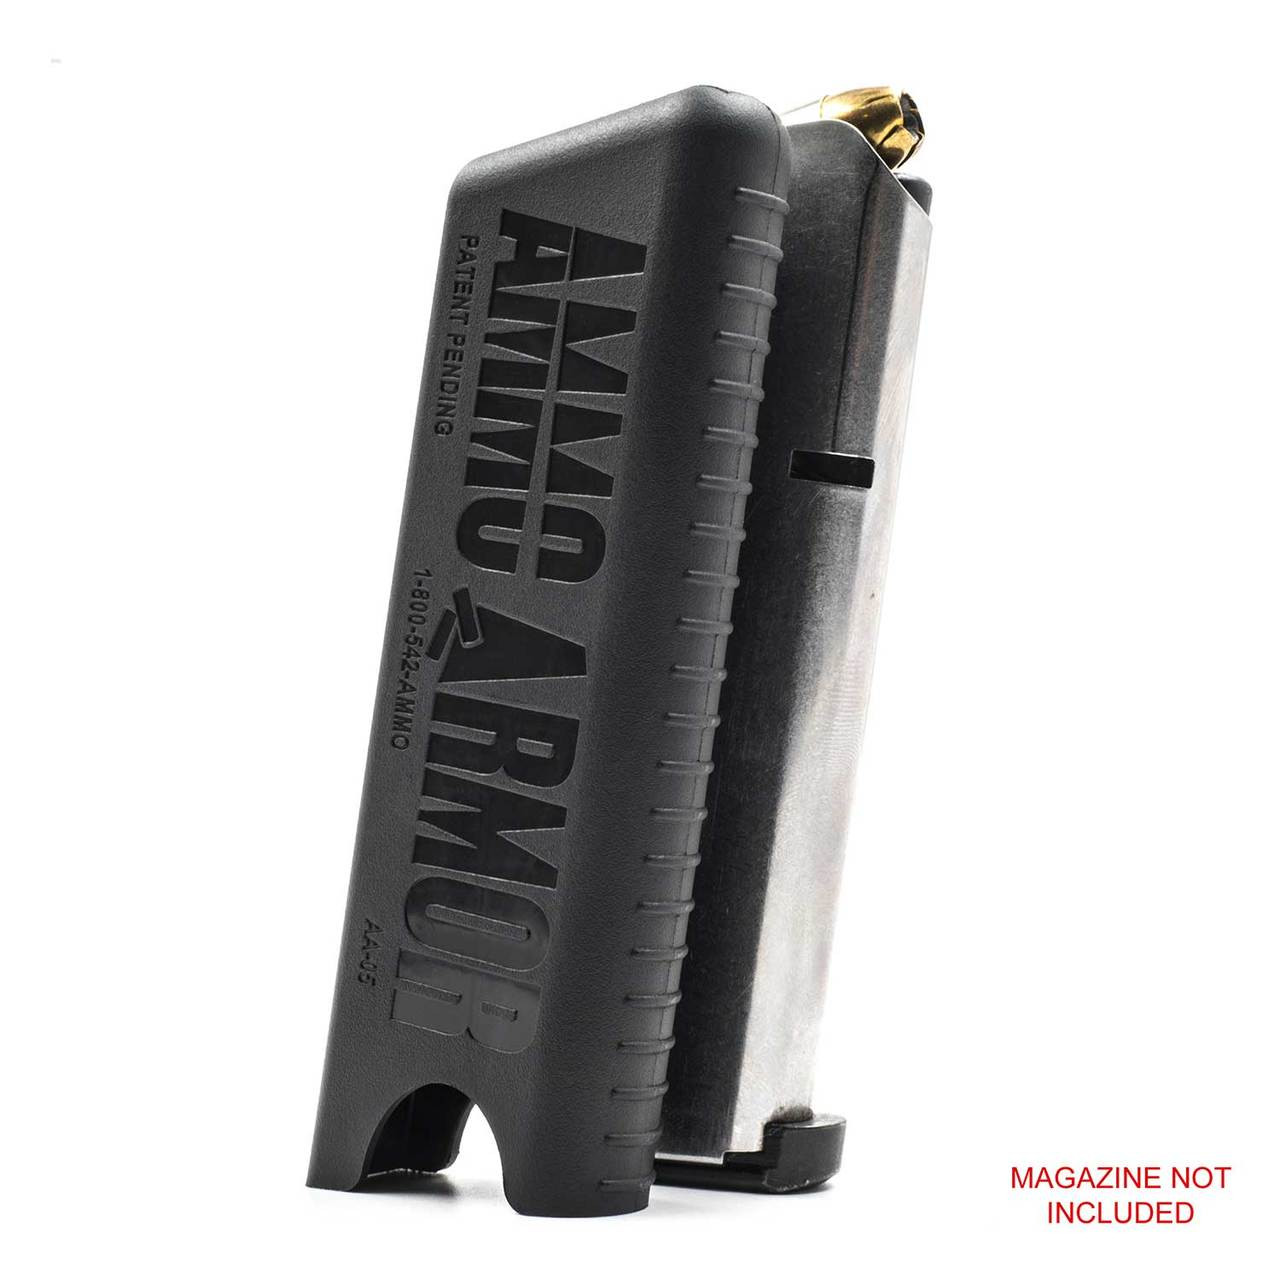 Kimber Super Carry Ultra+ (.45) Magazine Protector